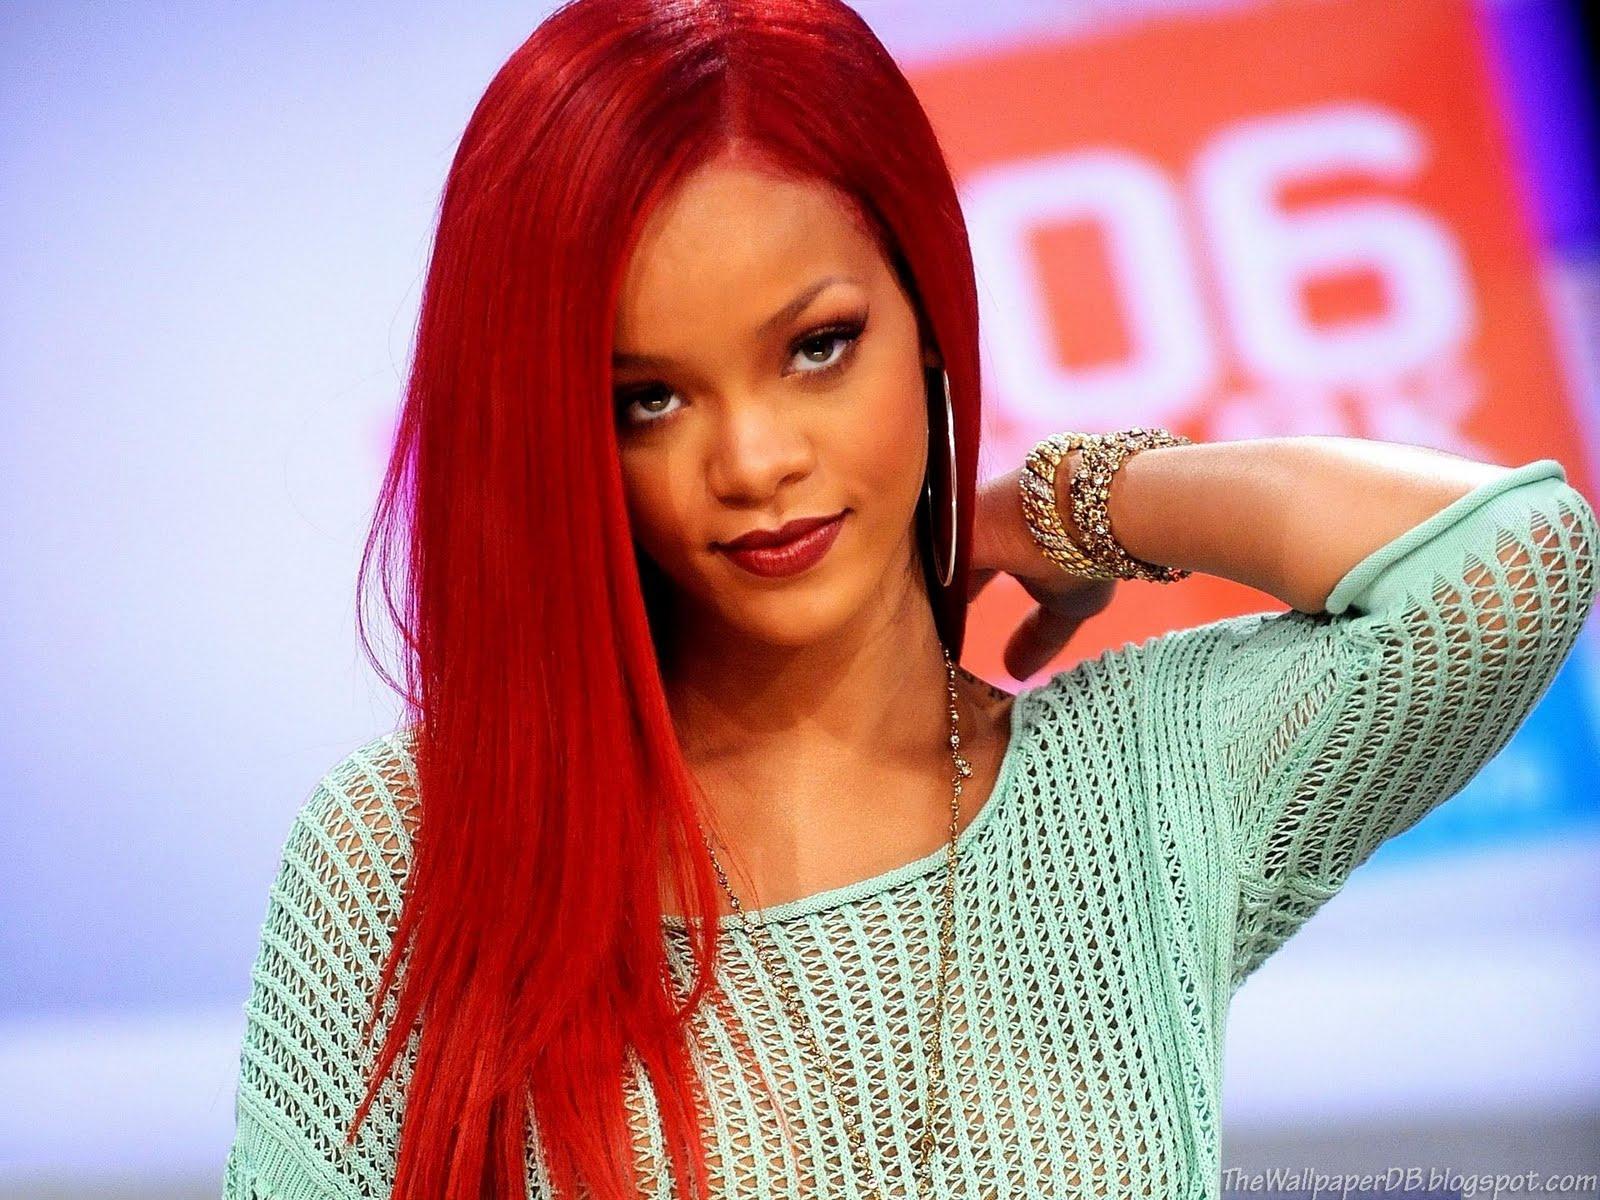 Rihanna Long Red Hair Style HD Wallpaper ~ The Wallpaper